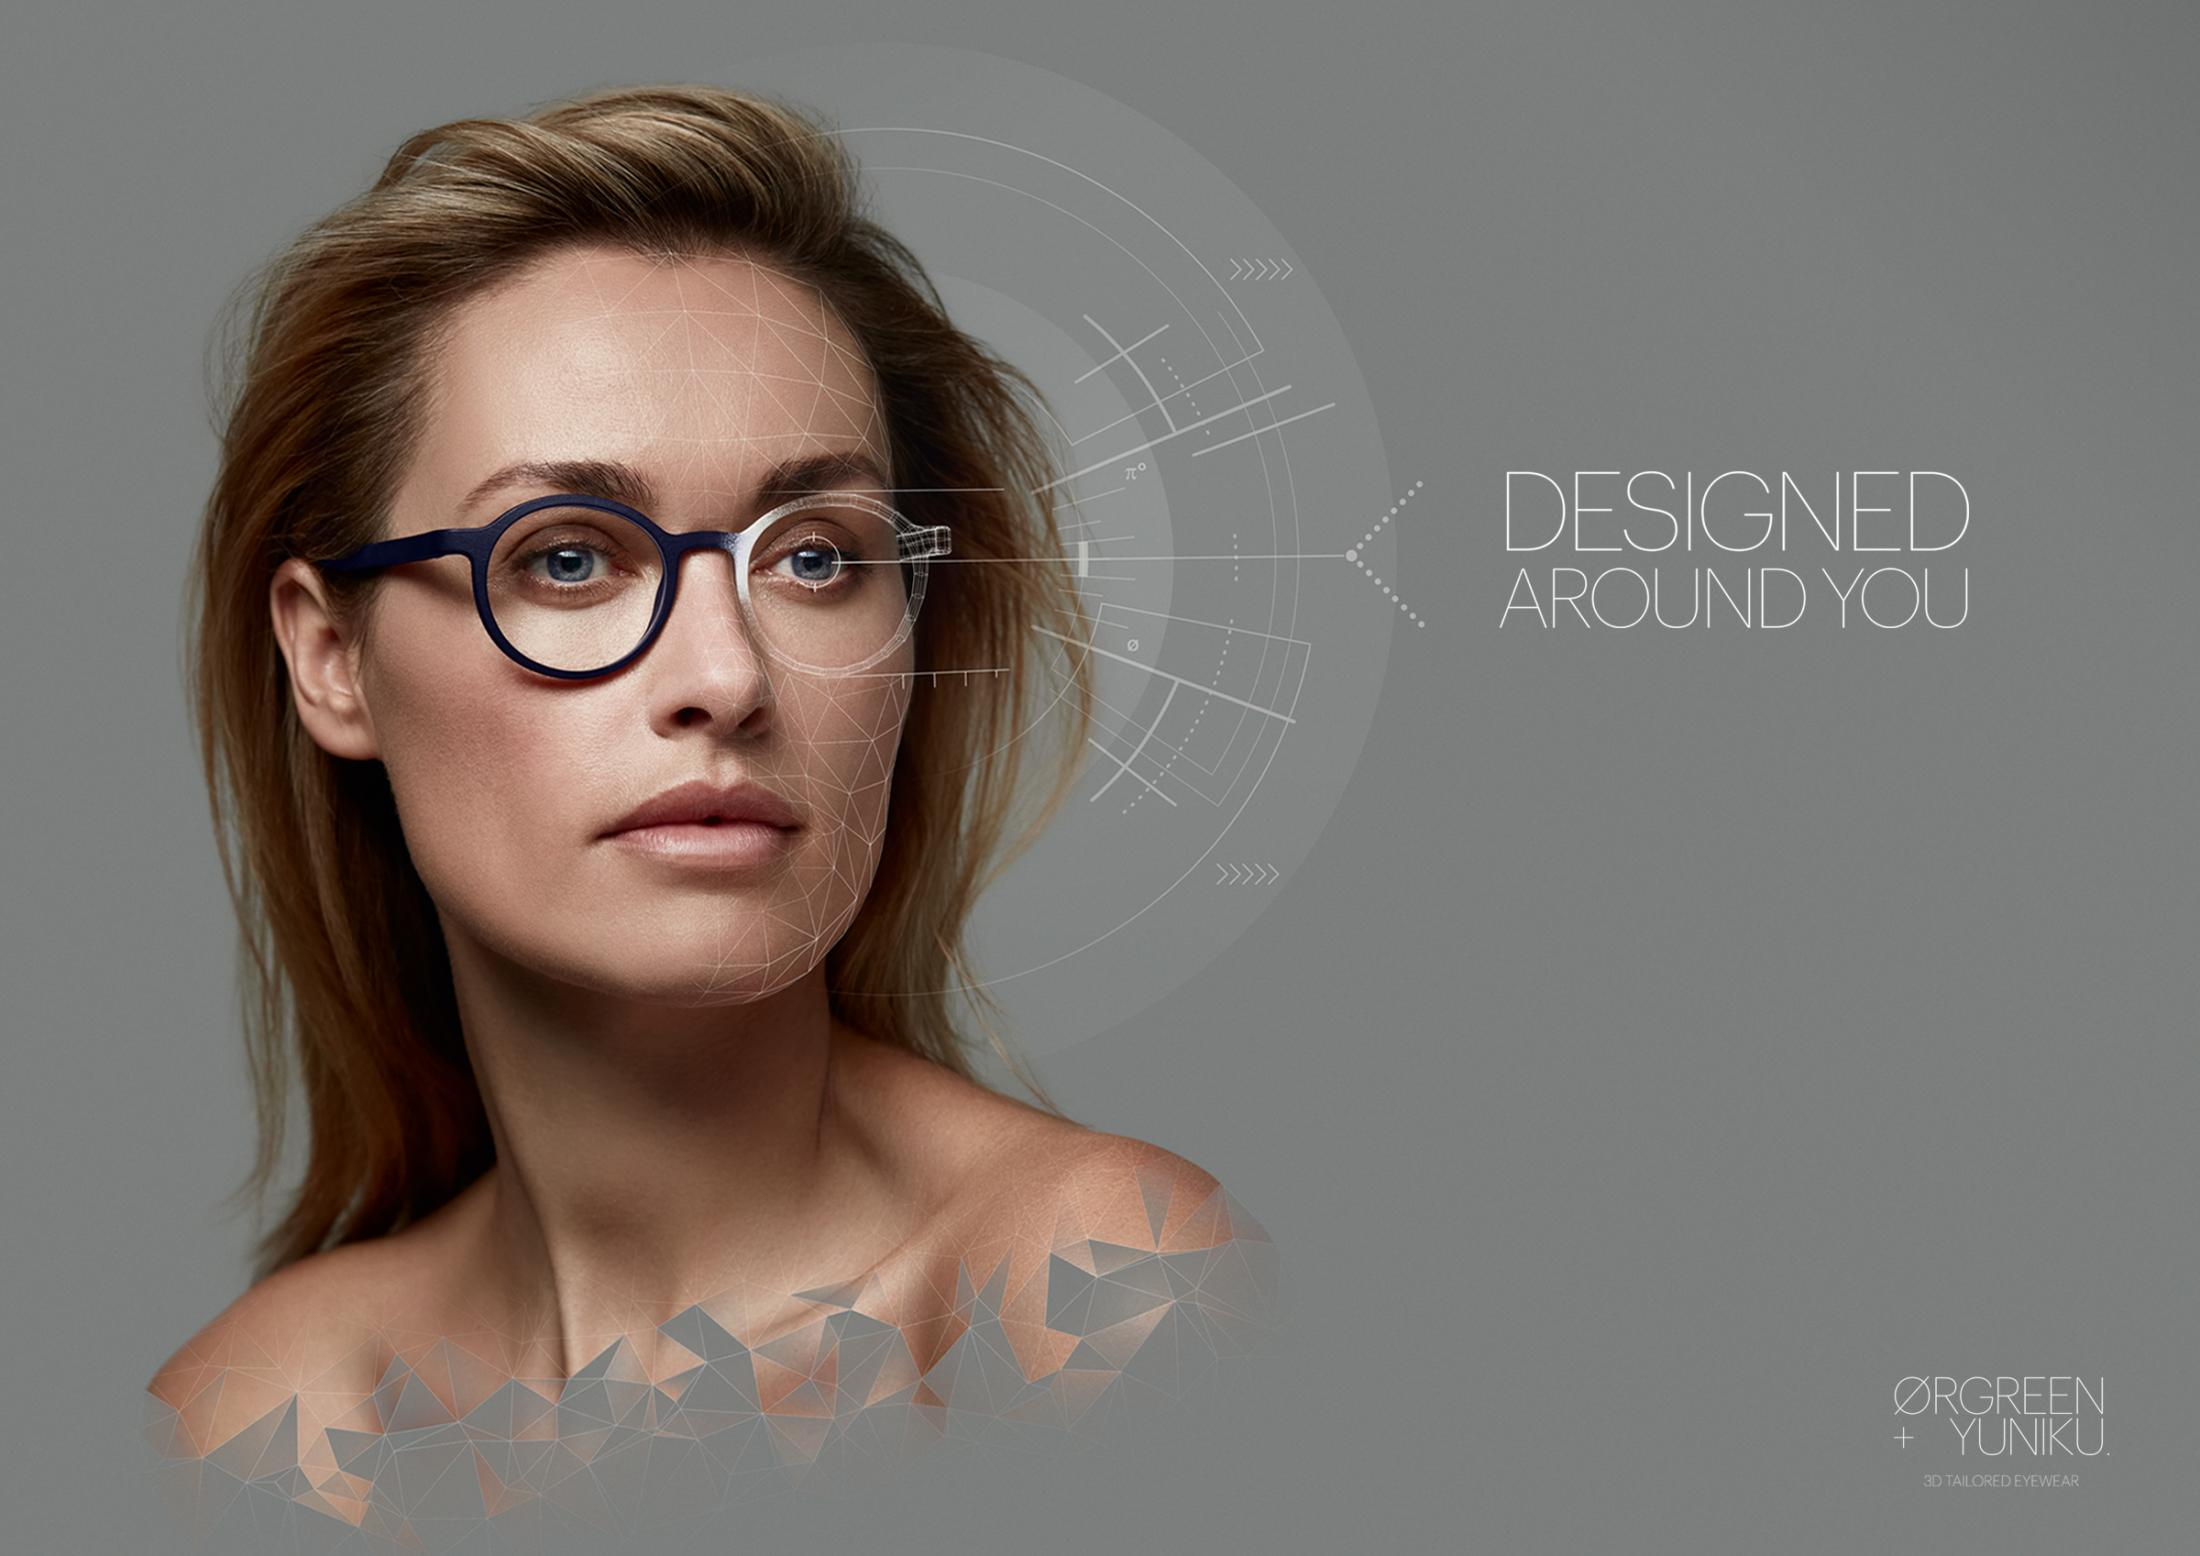 Ørgreen + Yuniku Print Ad - Designed Around You - Joyce